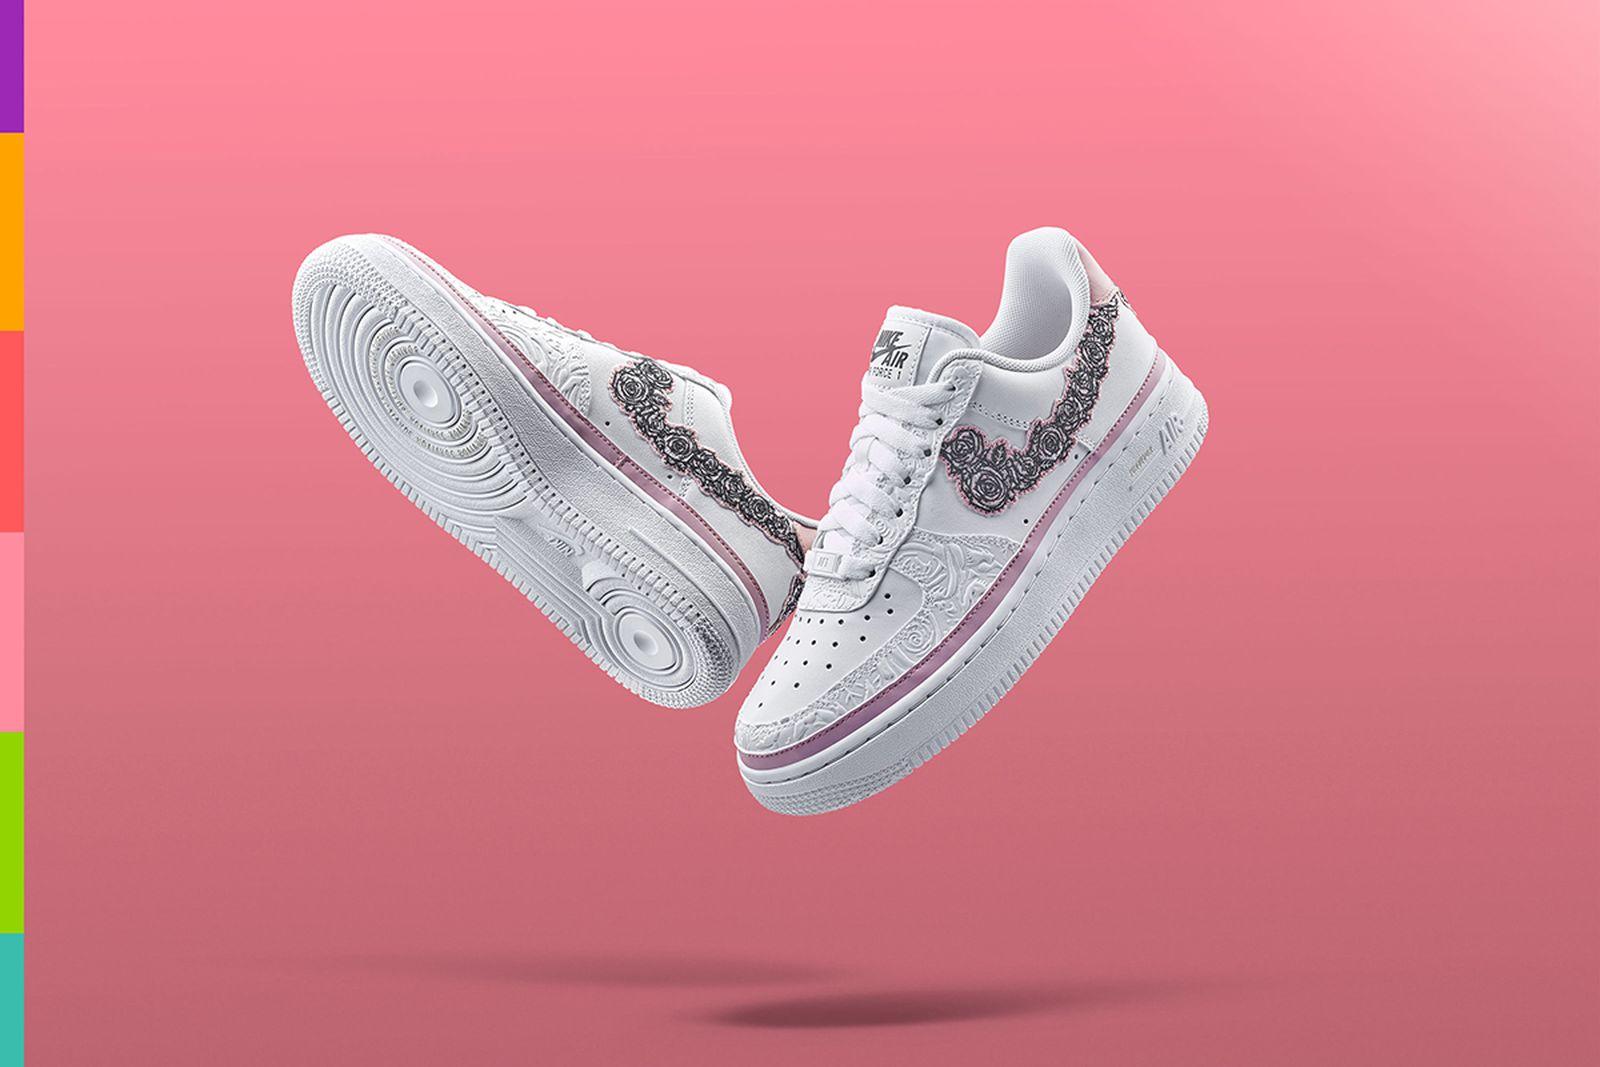 Nike Doernbecher Freestyle 2019 Air Force 1